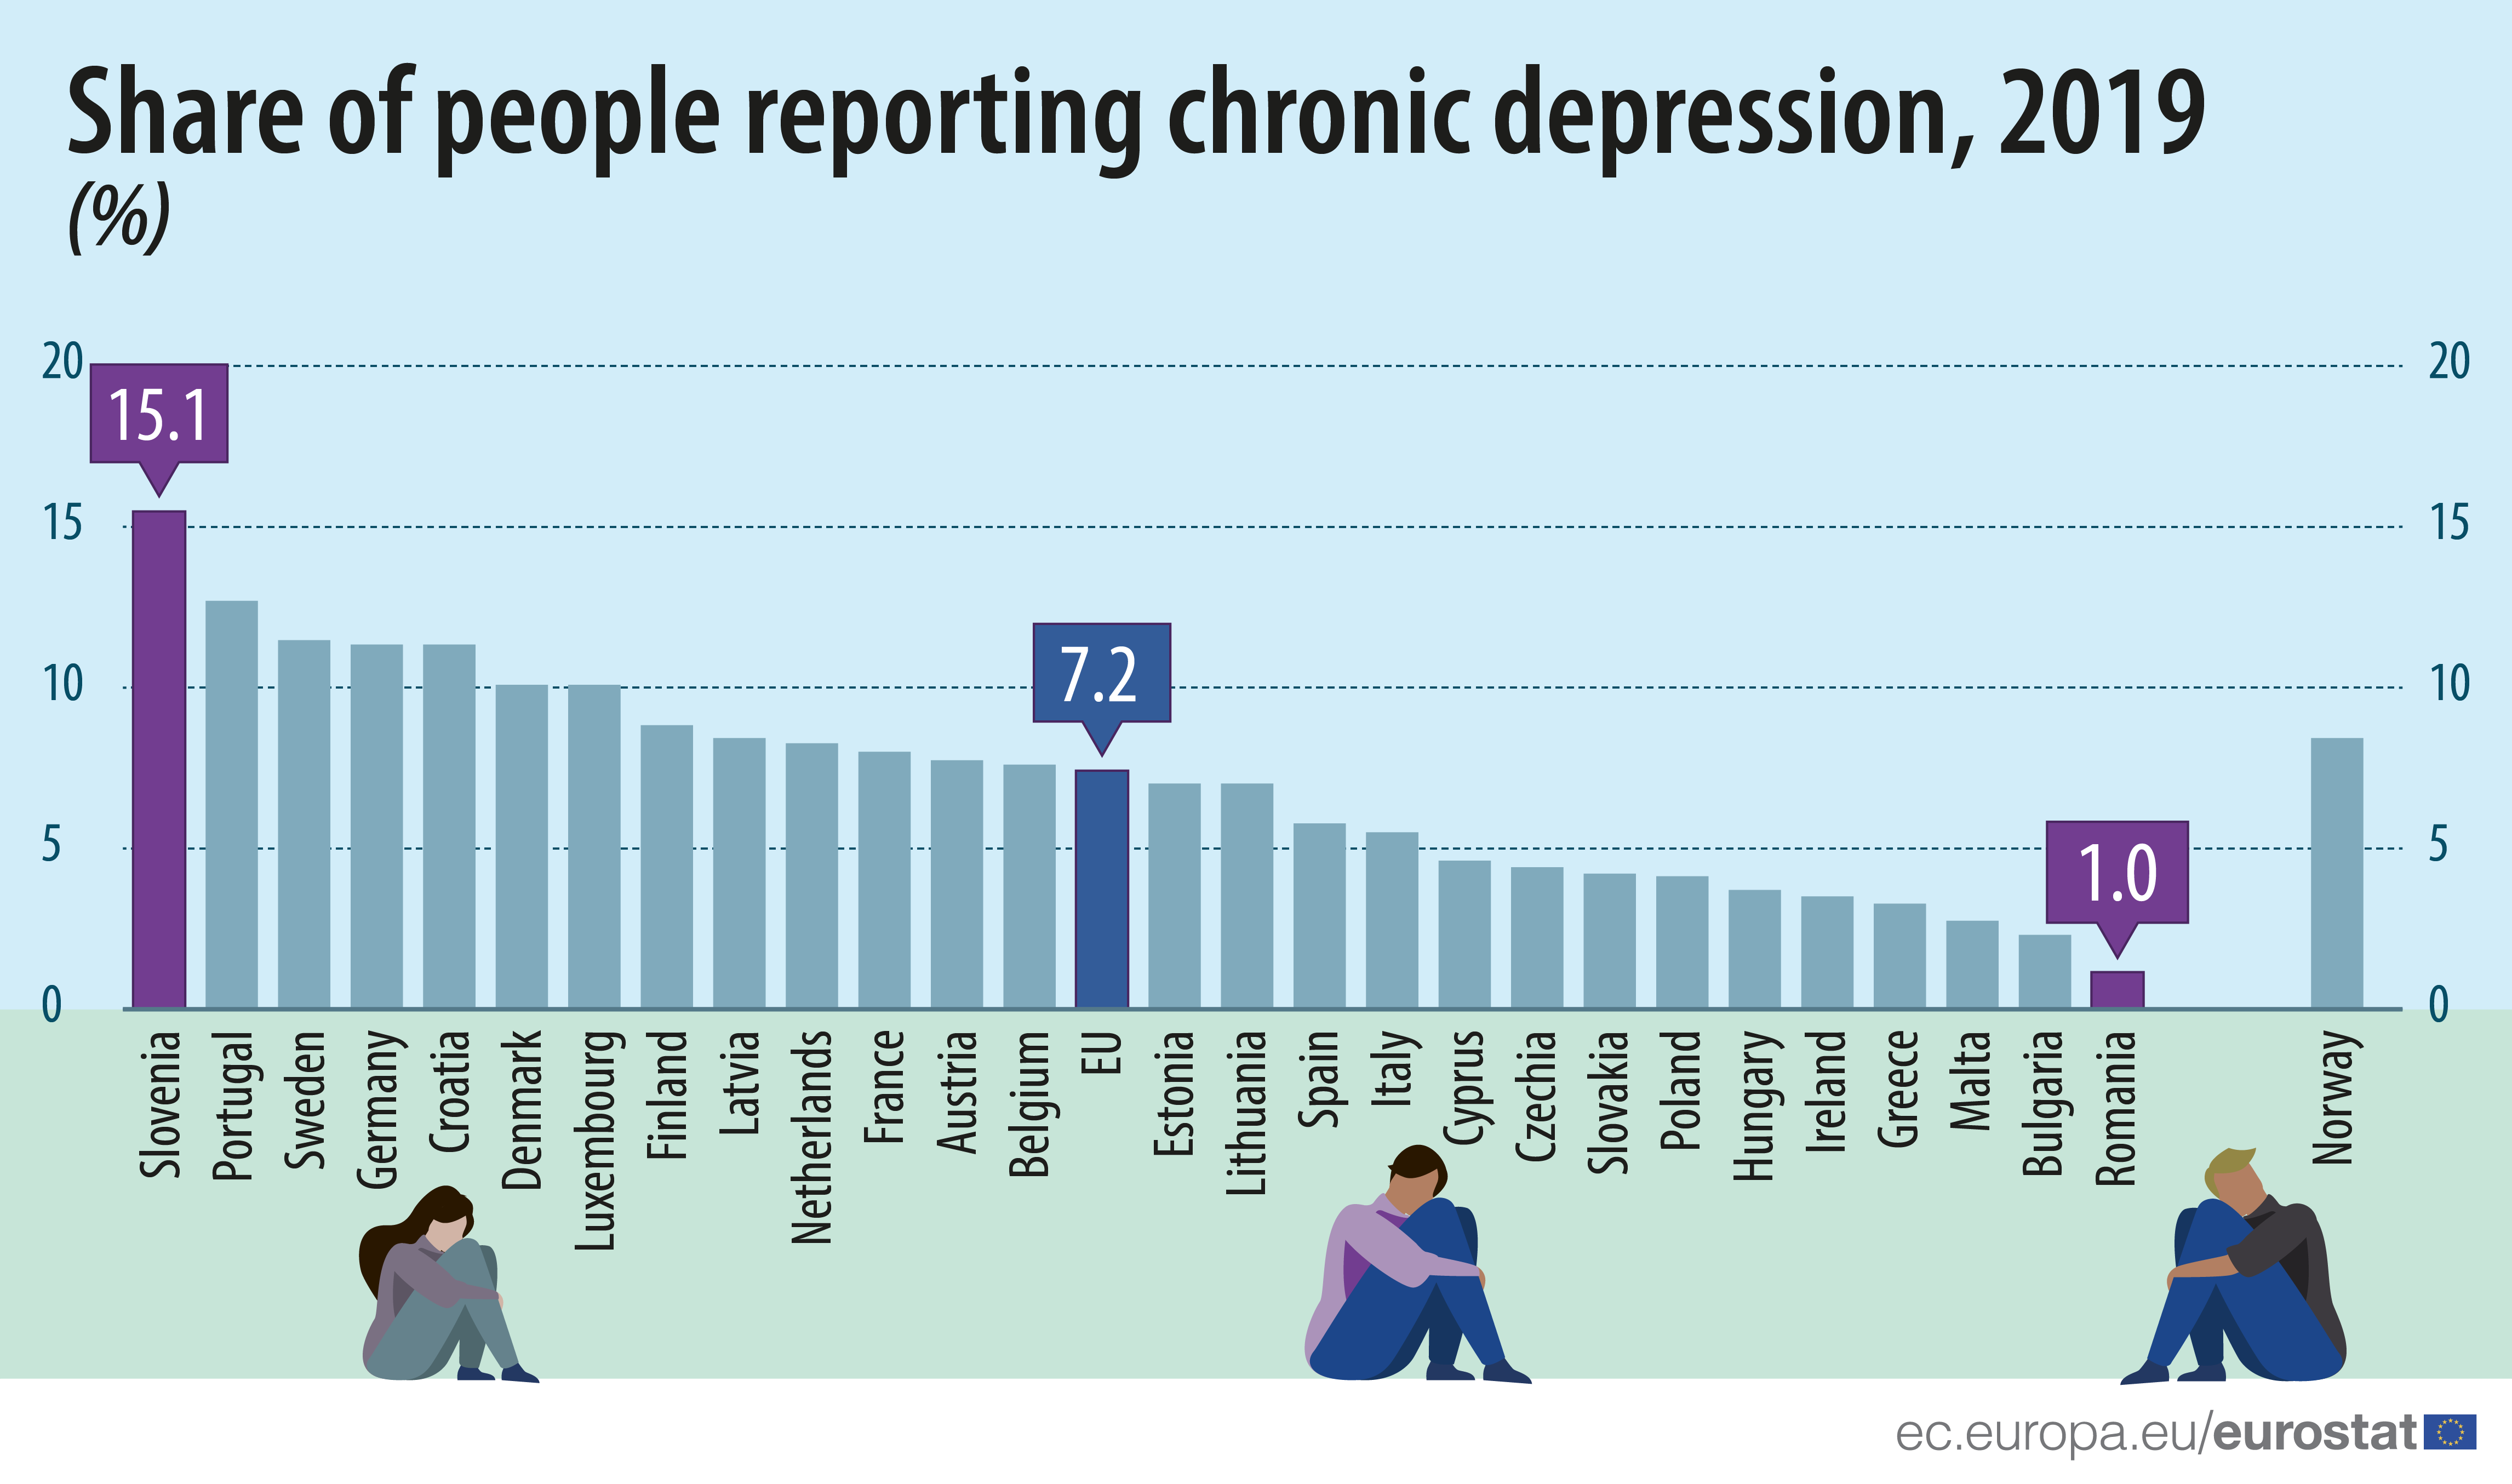 Bar chart: share of people reporting chronic depression, EU/EFTA, 2019 data